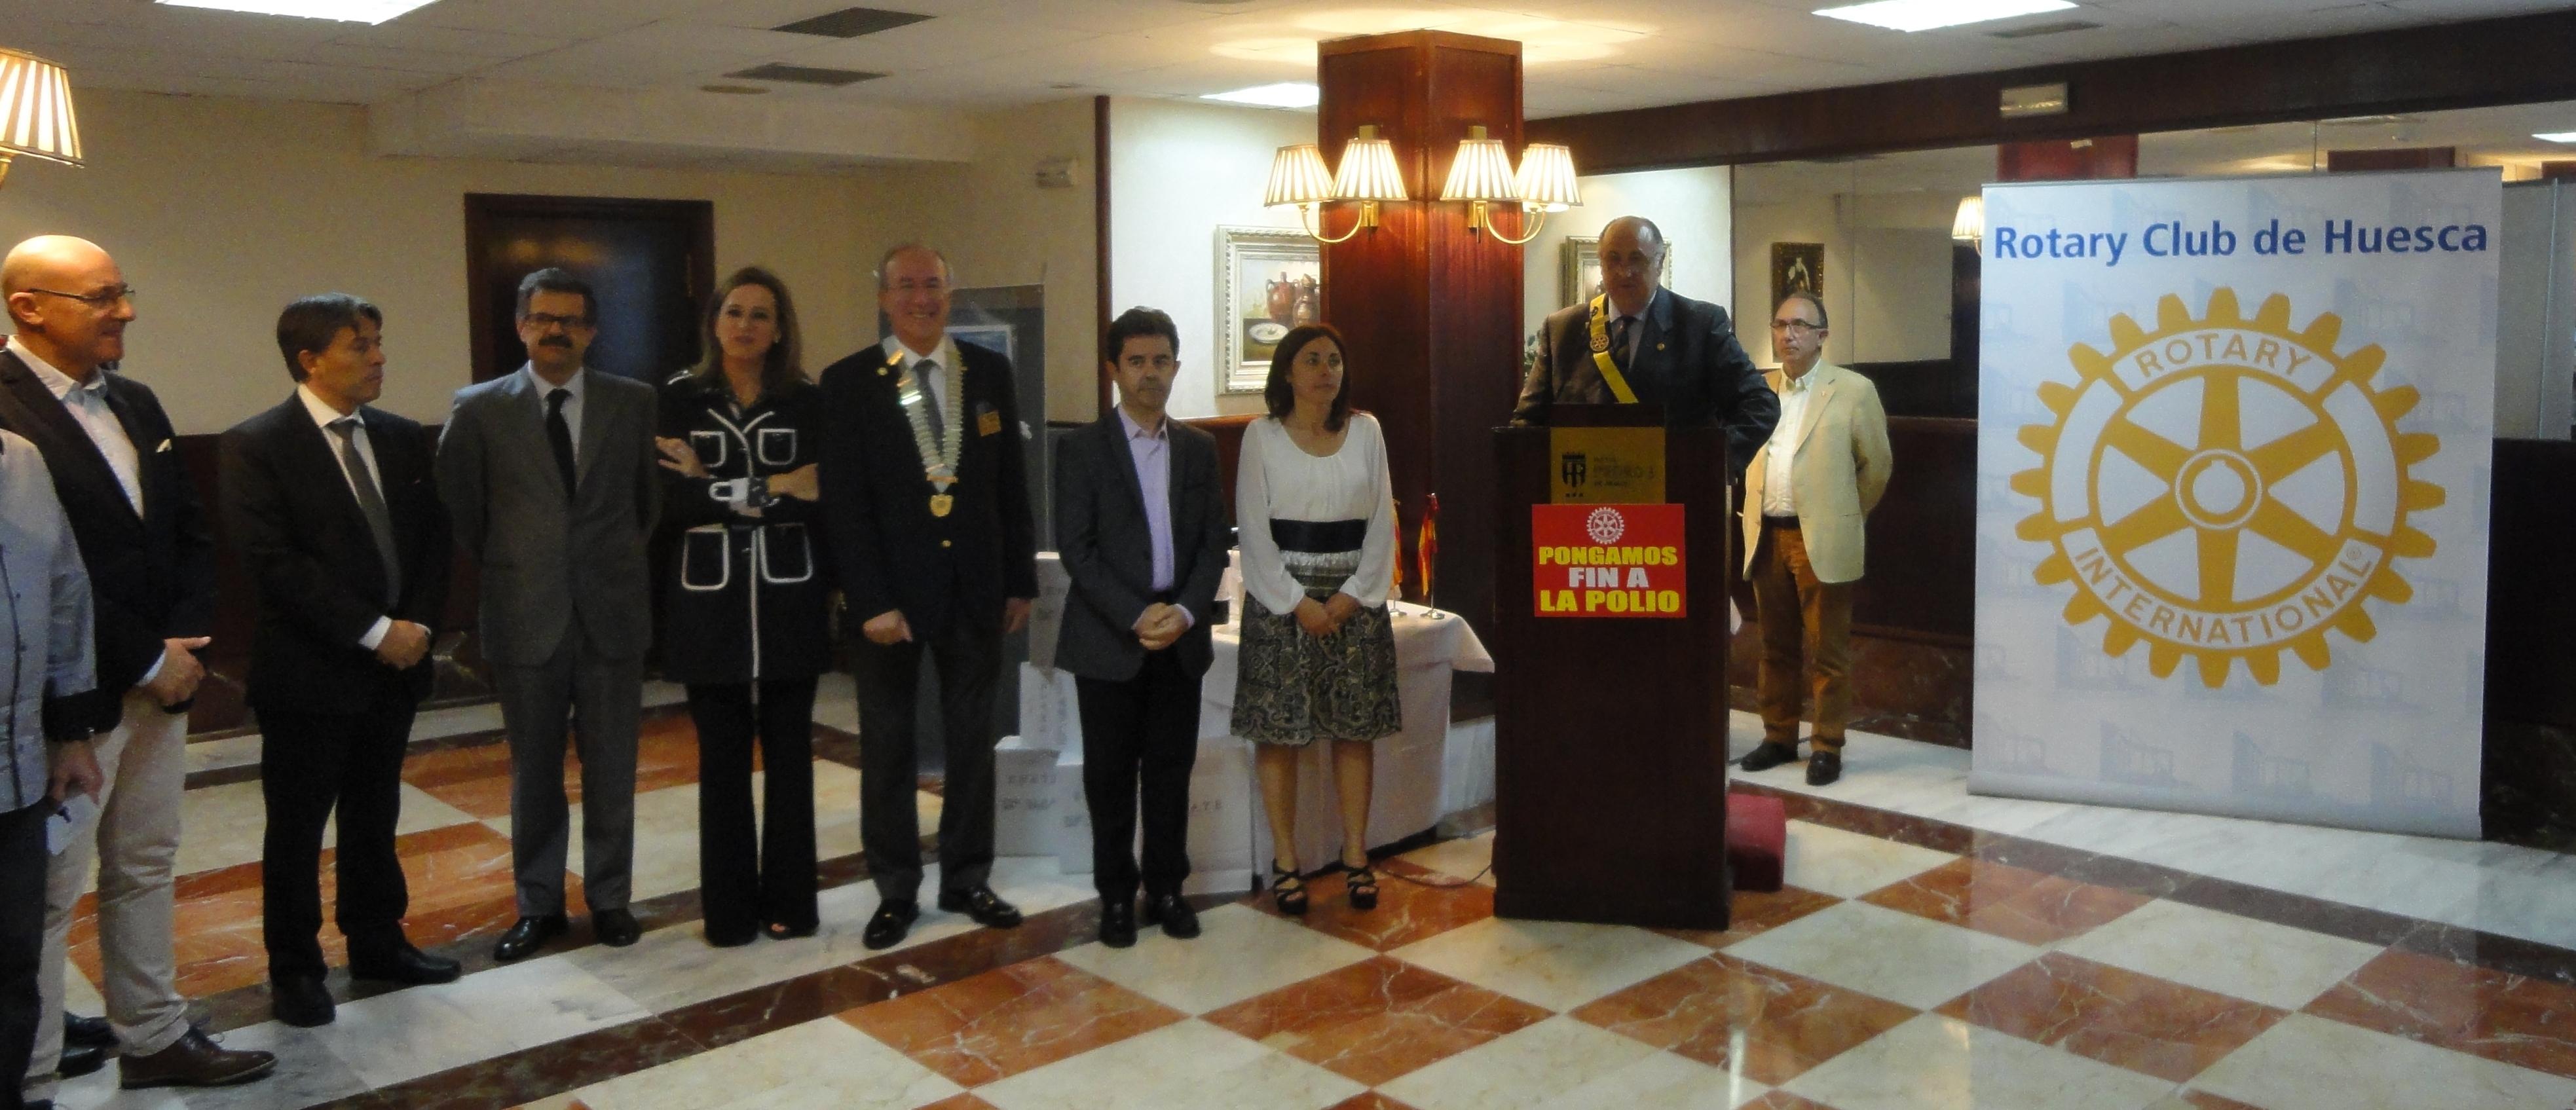 Rotary-Vino-Solidario-150928-002